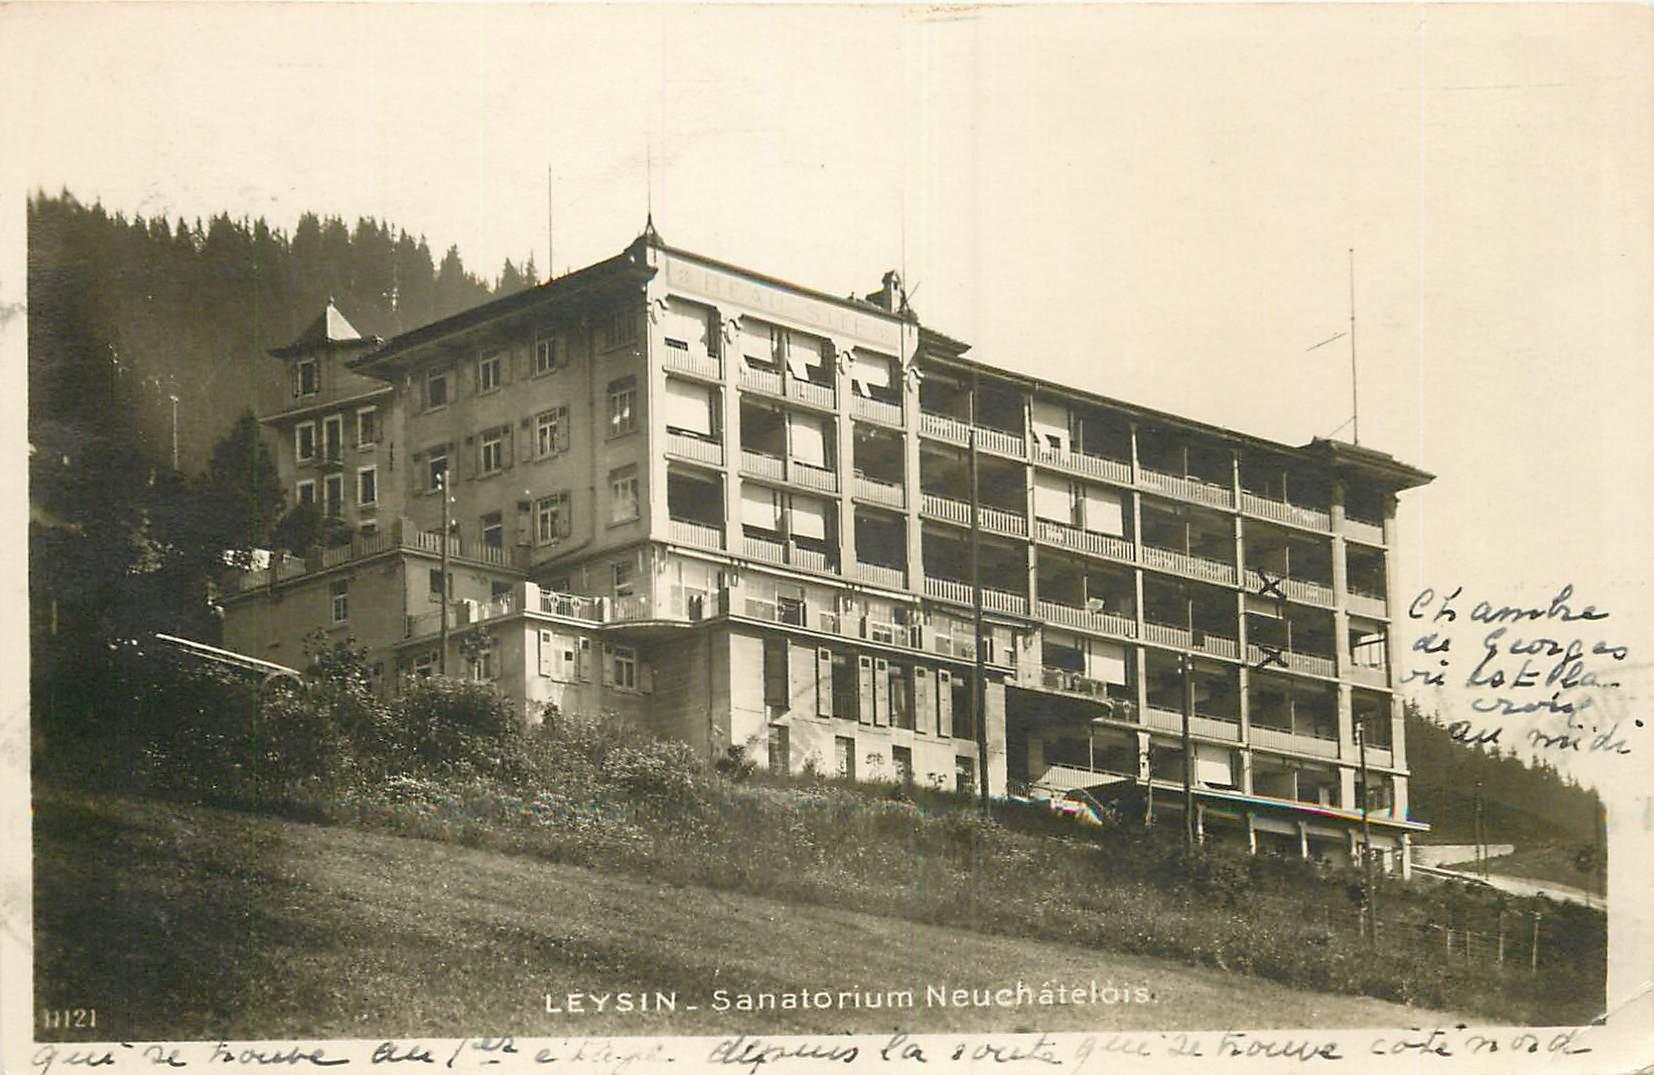 WW LEYSIN. Sanatorium Neuchatelon 1931 Suisse